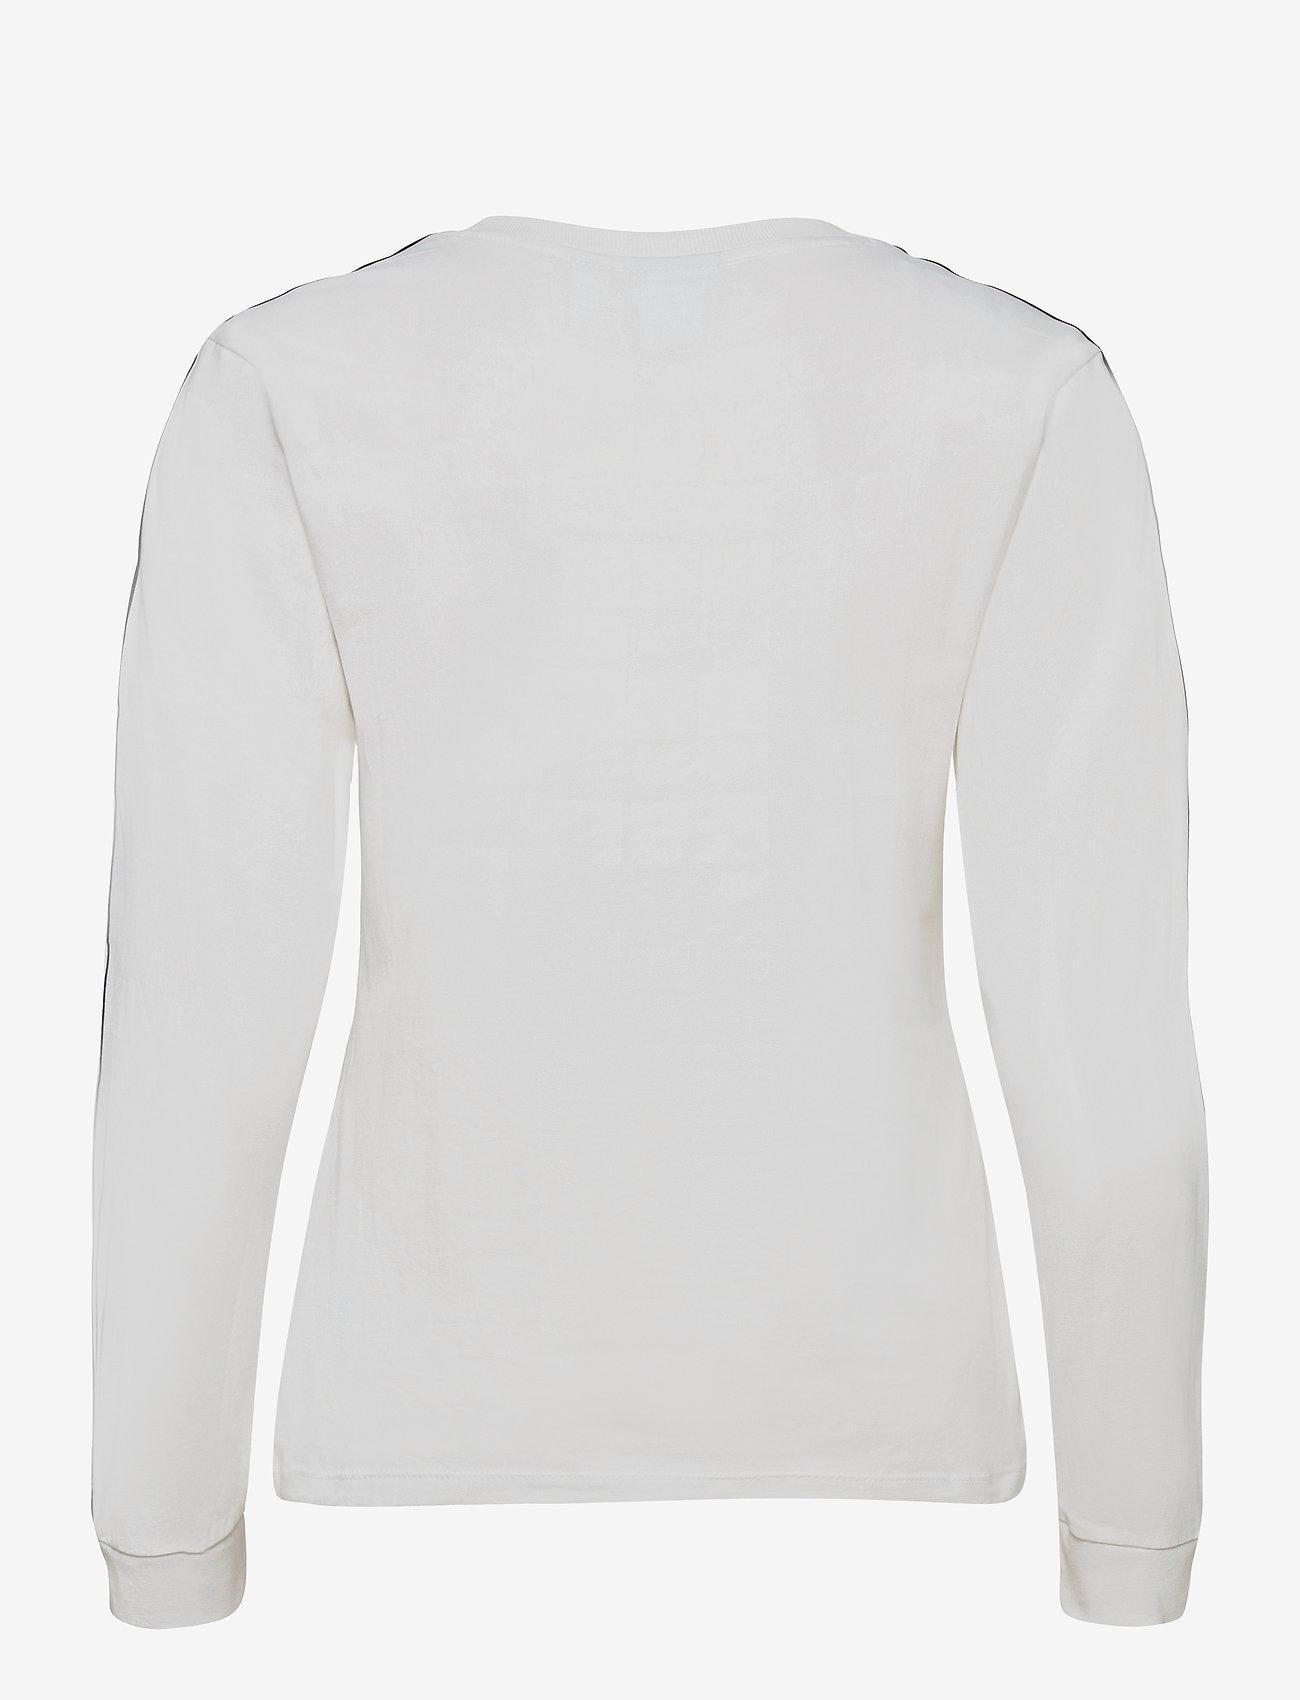 adidas Originals - Adicolor Classics Long Sleeve T-Shirt W - topjes met lange mouwen - white/black - 1